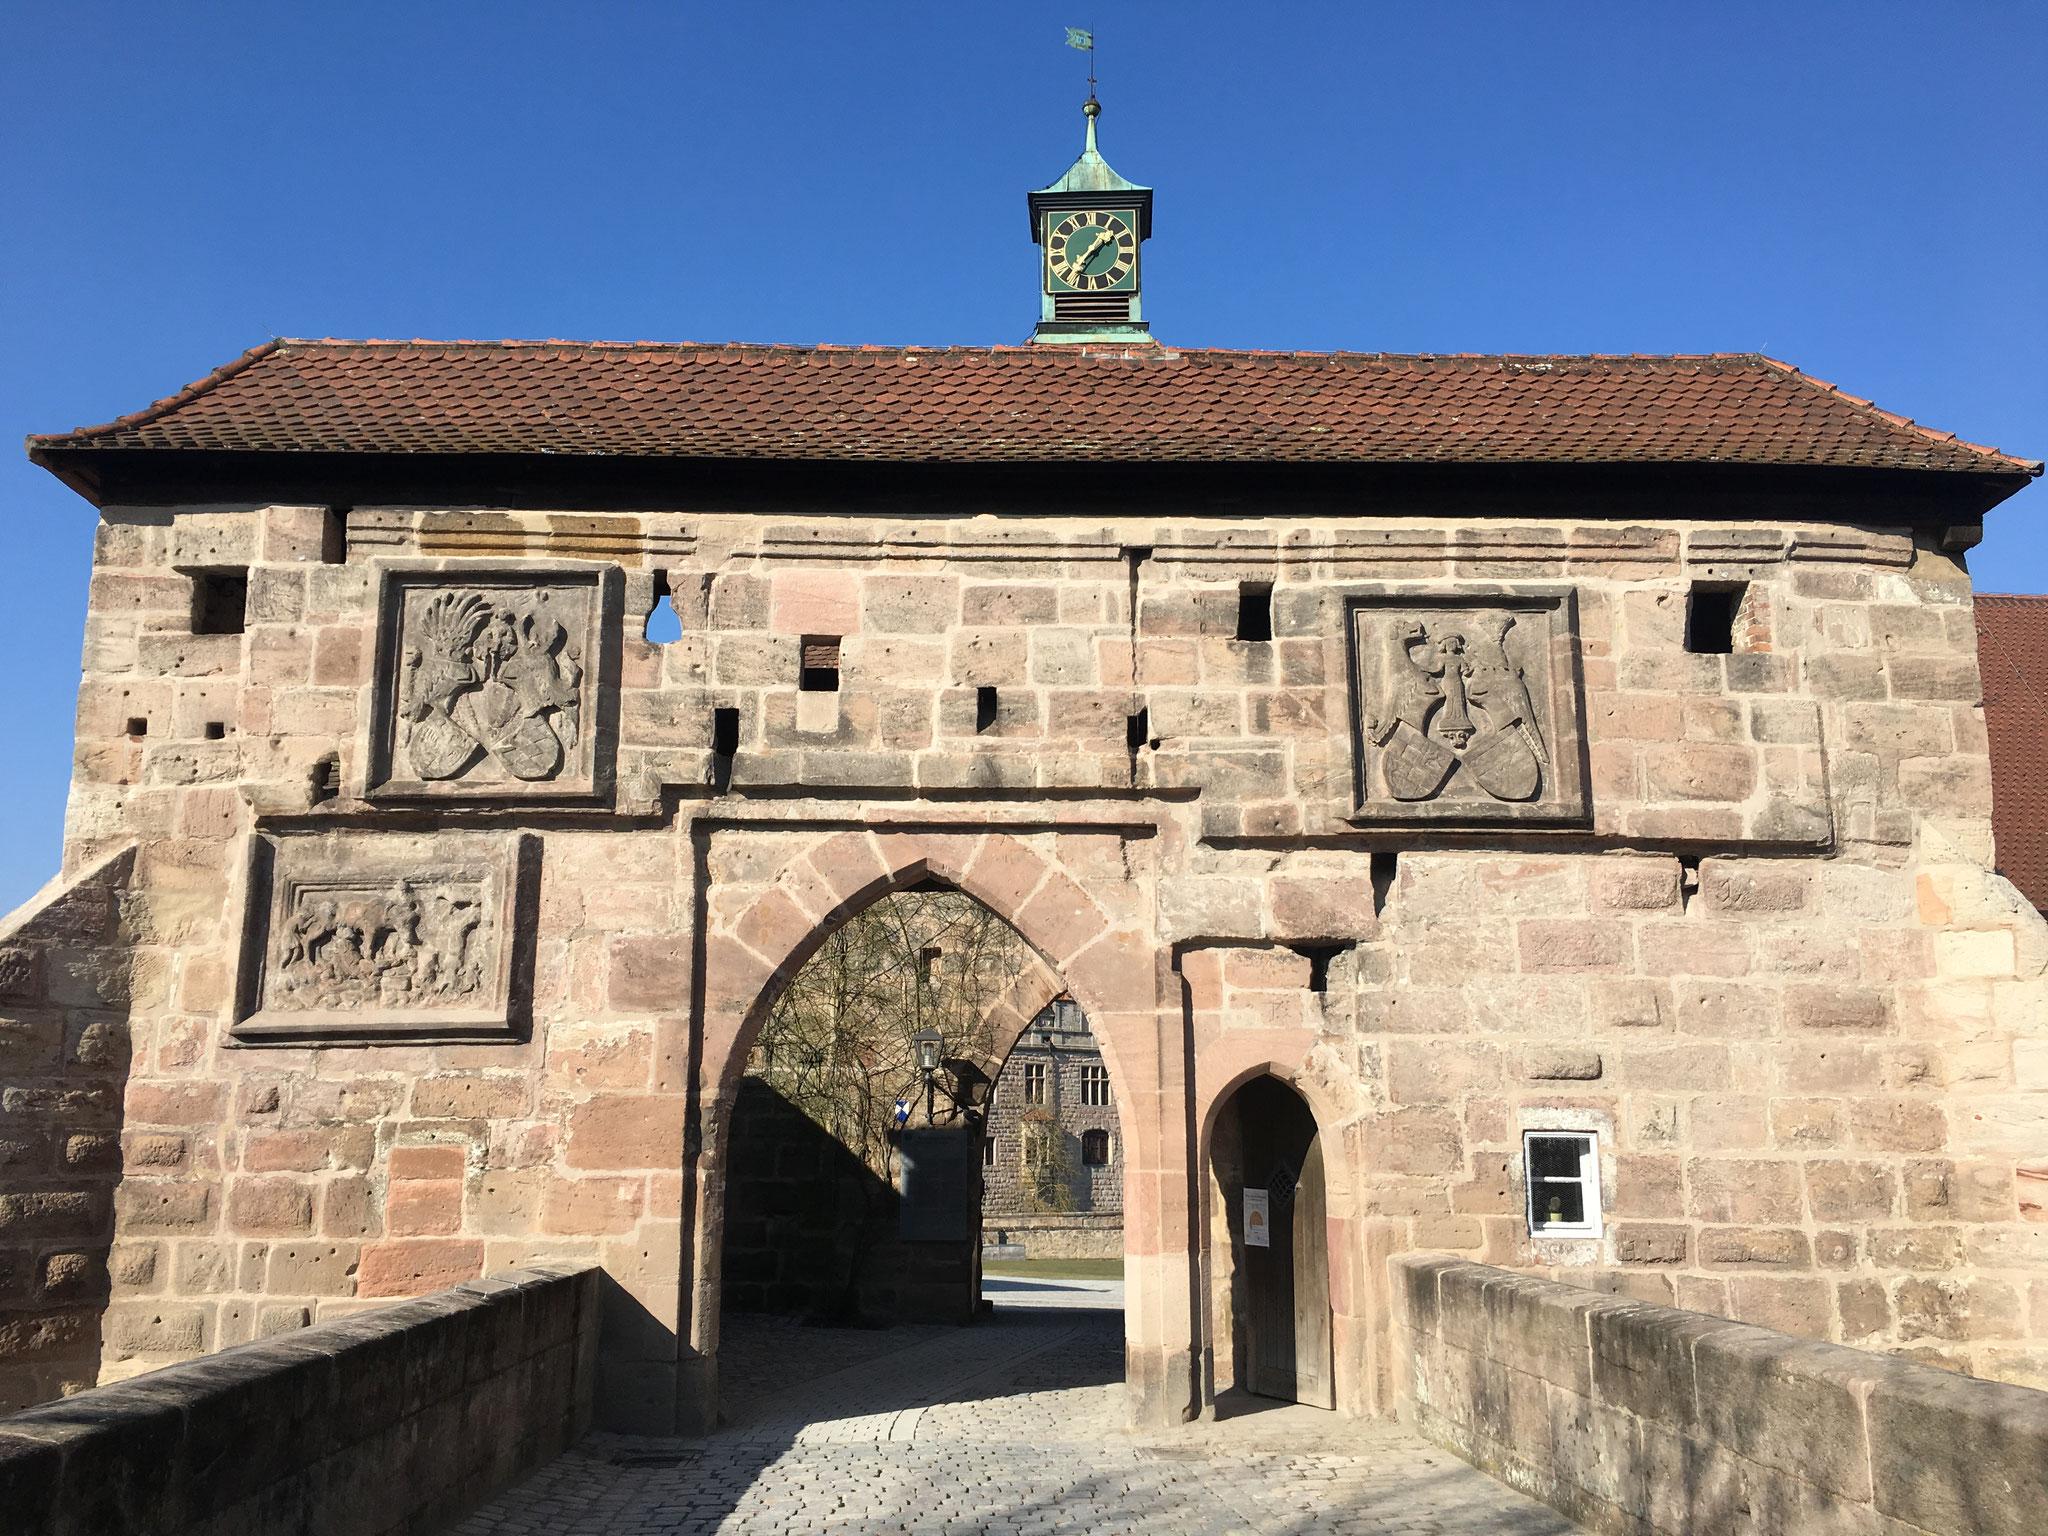 Eingangstor zur Cadolzburg